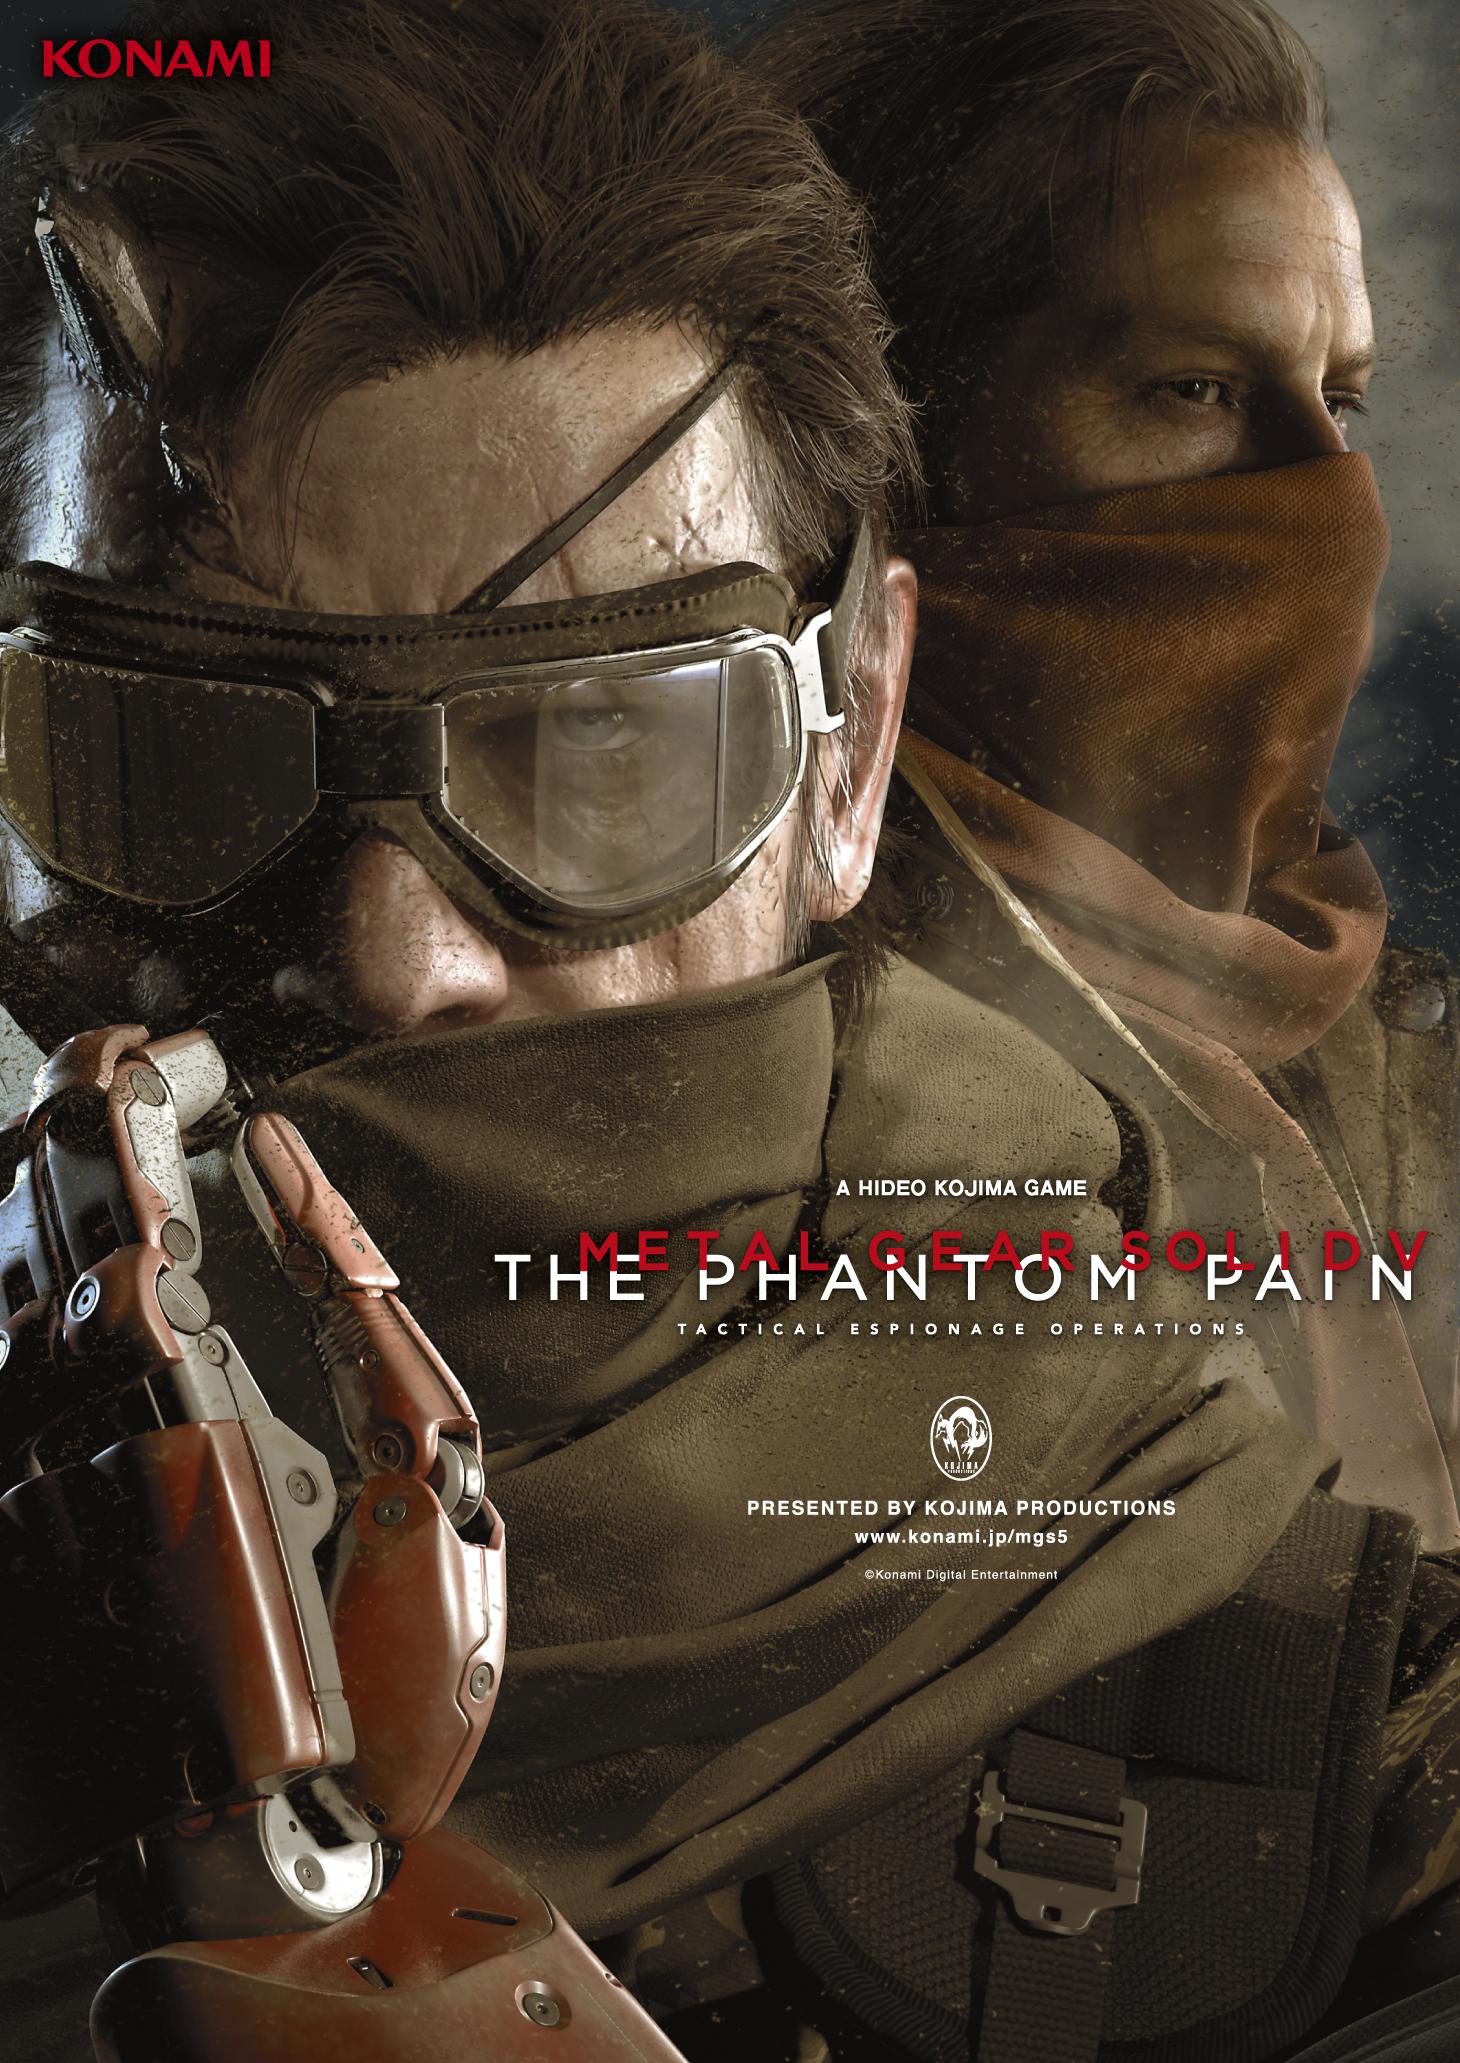 Metal-Gear-Solid-V-The-Phantom-Pain_2014_06-09-14_018